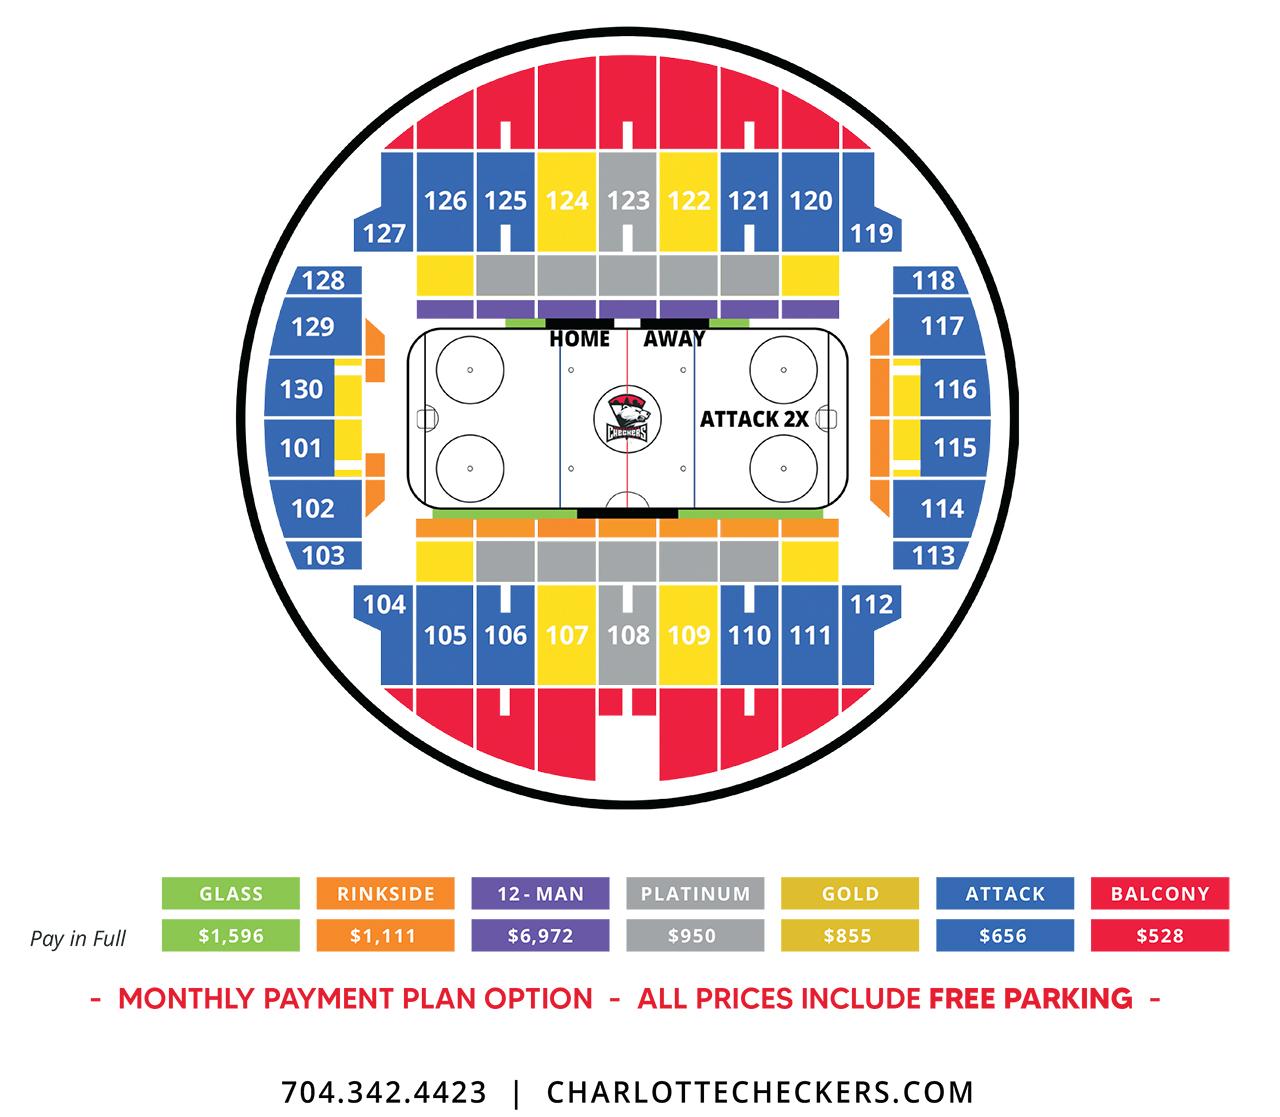 Charlotte Checkers season ticket pricing